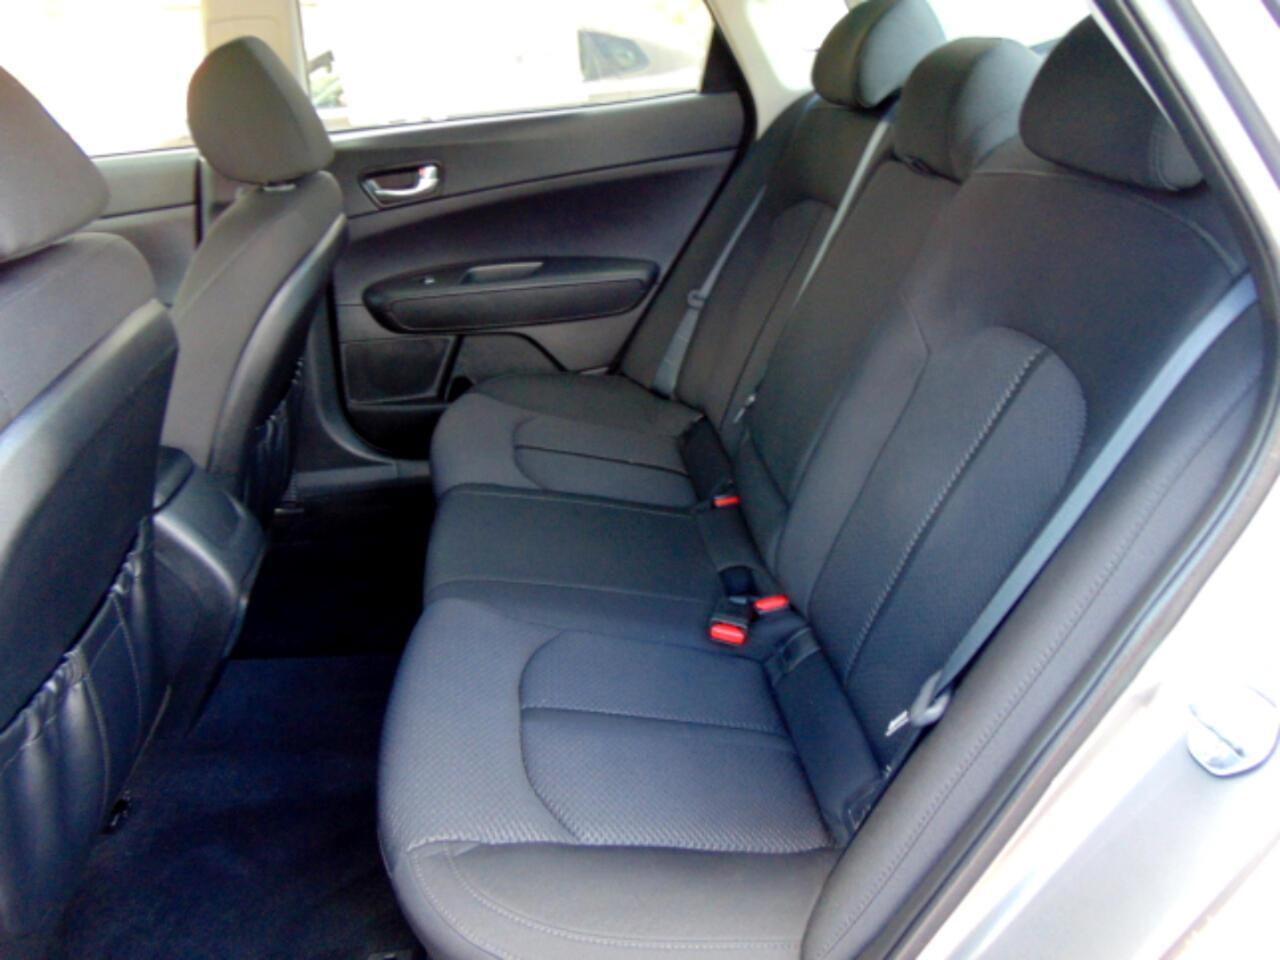 2016 Kia Optima 4dr Sdn LX Auto